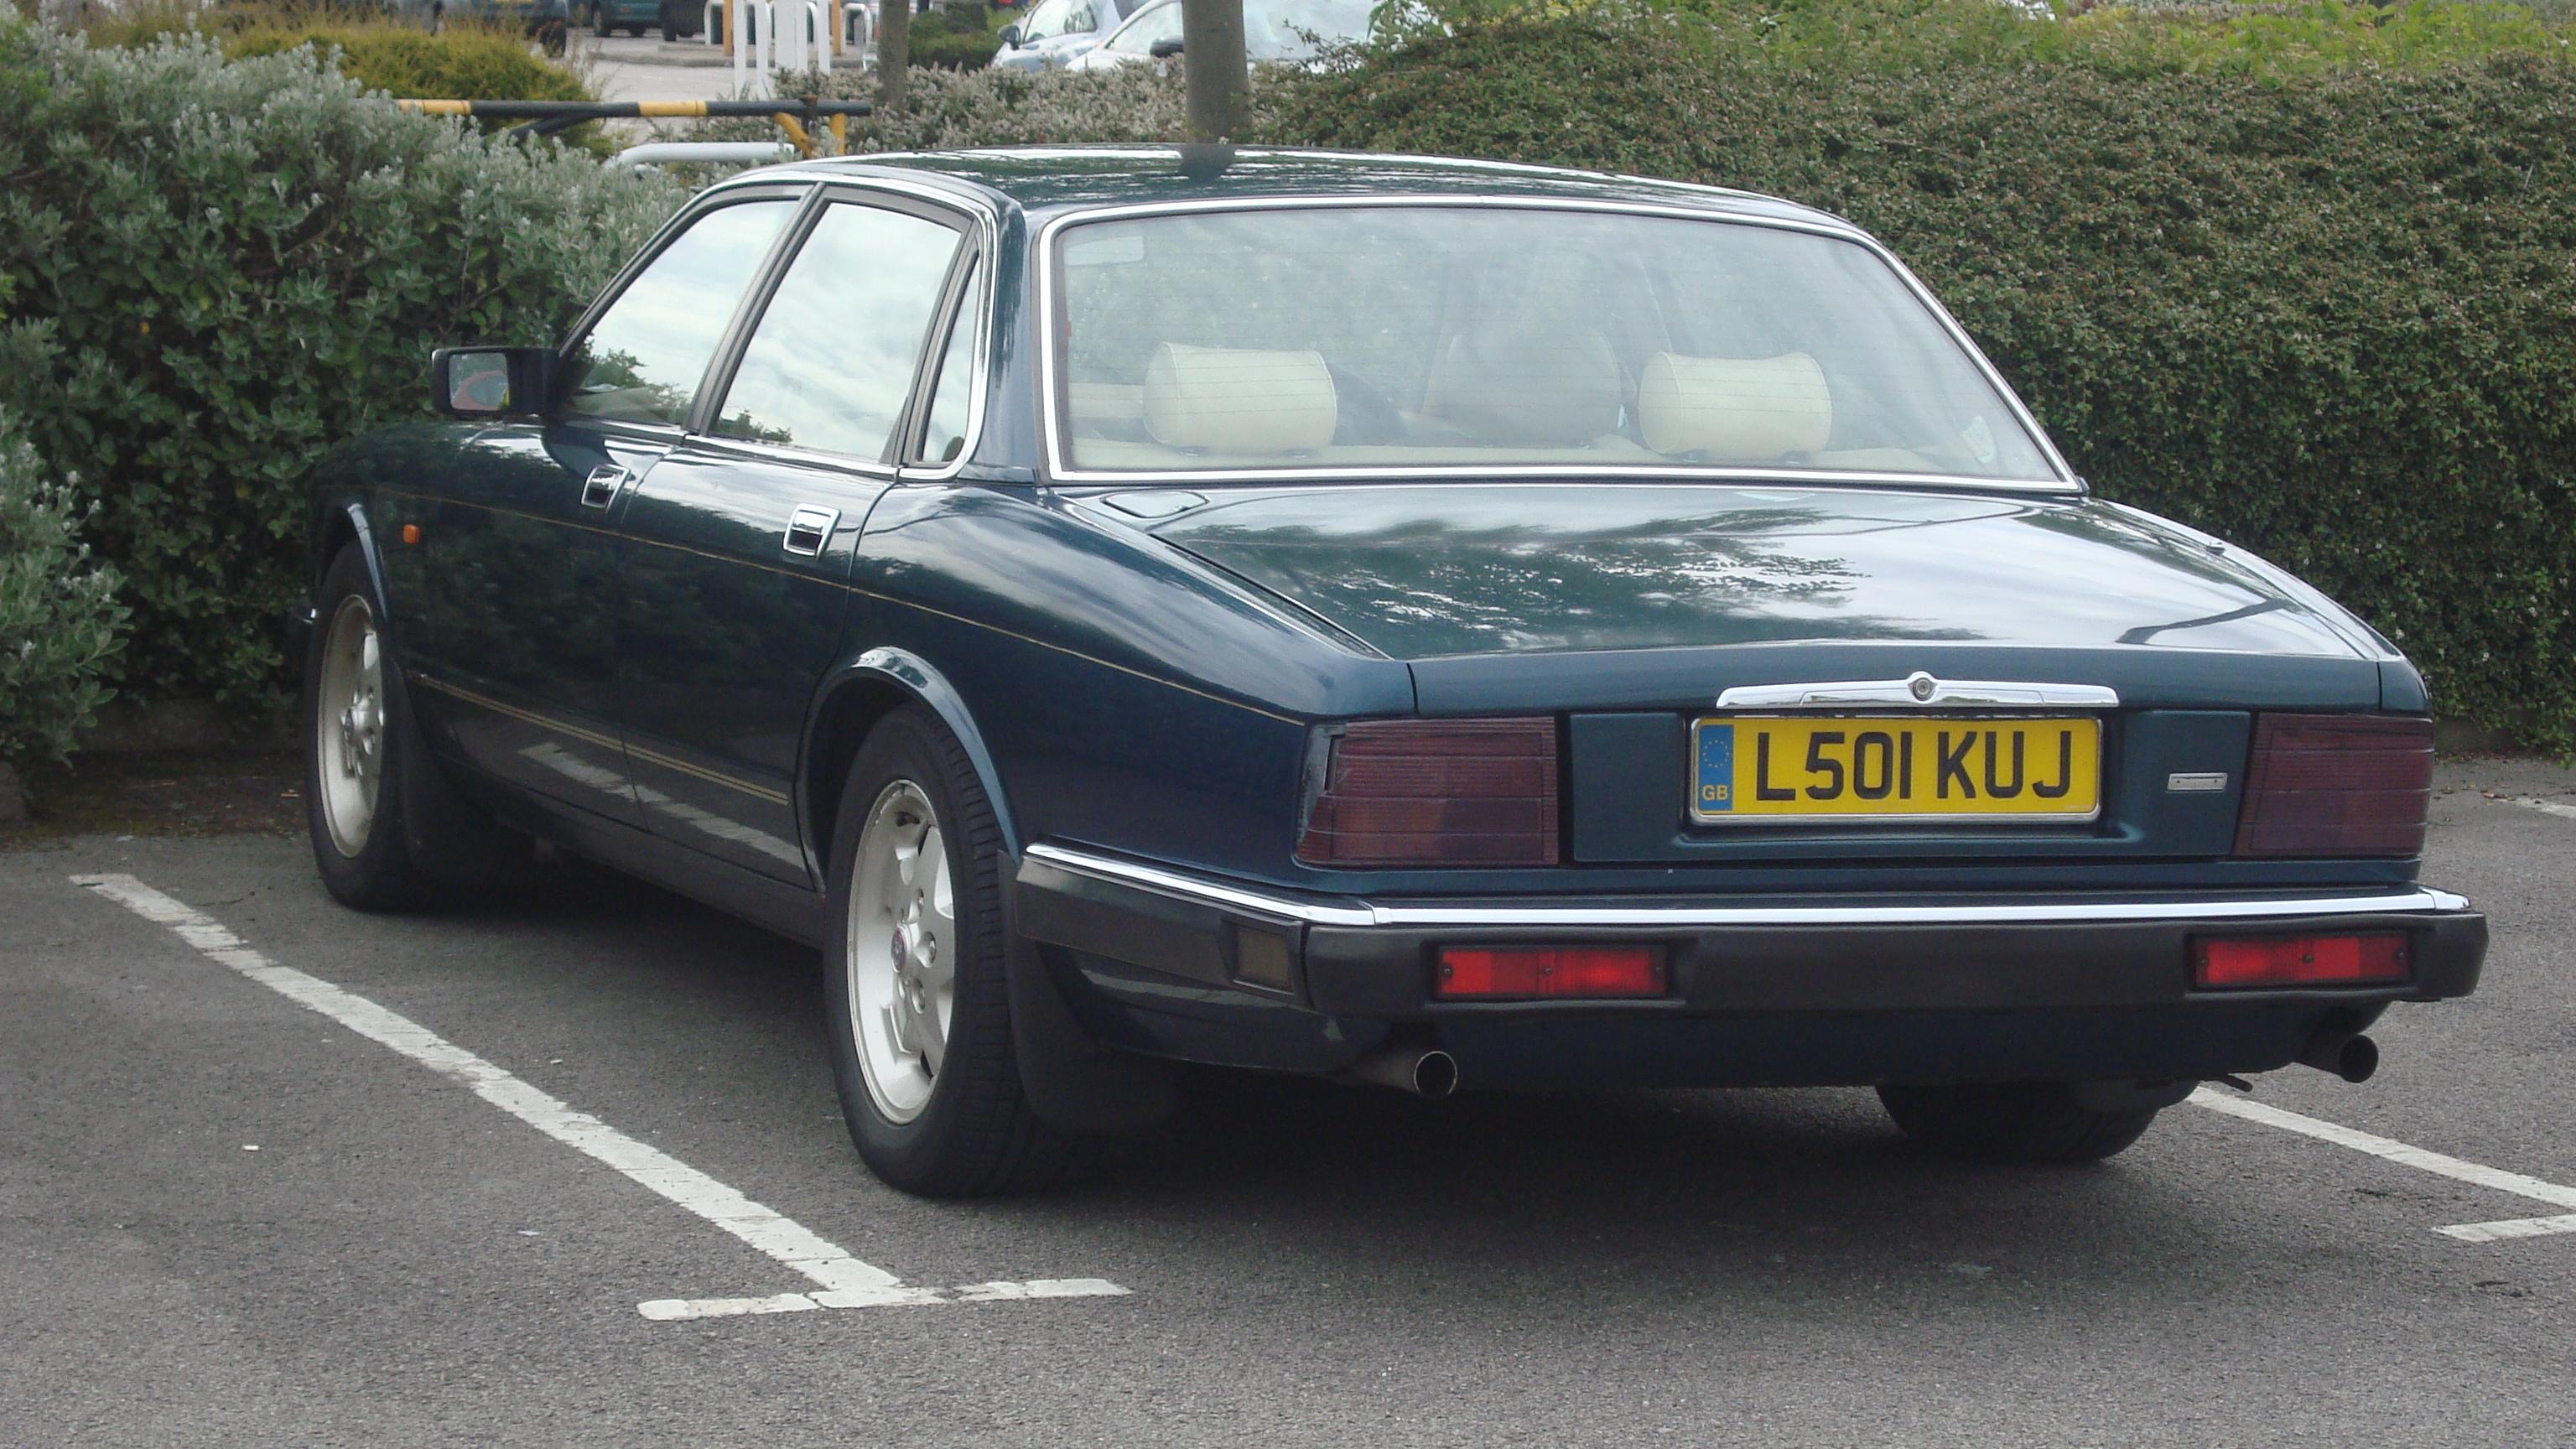 Beautiful File:1994 Jaguar XJ6 3.2S (14275699804)